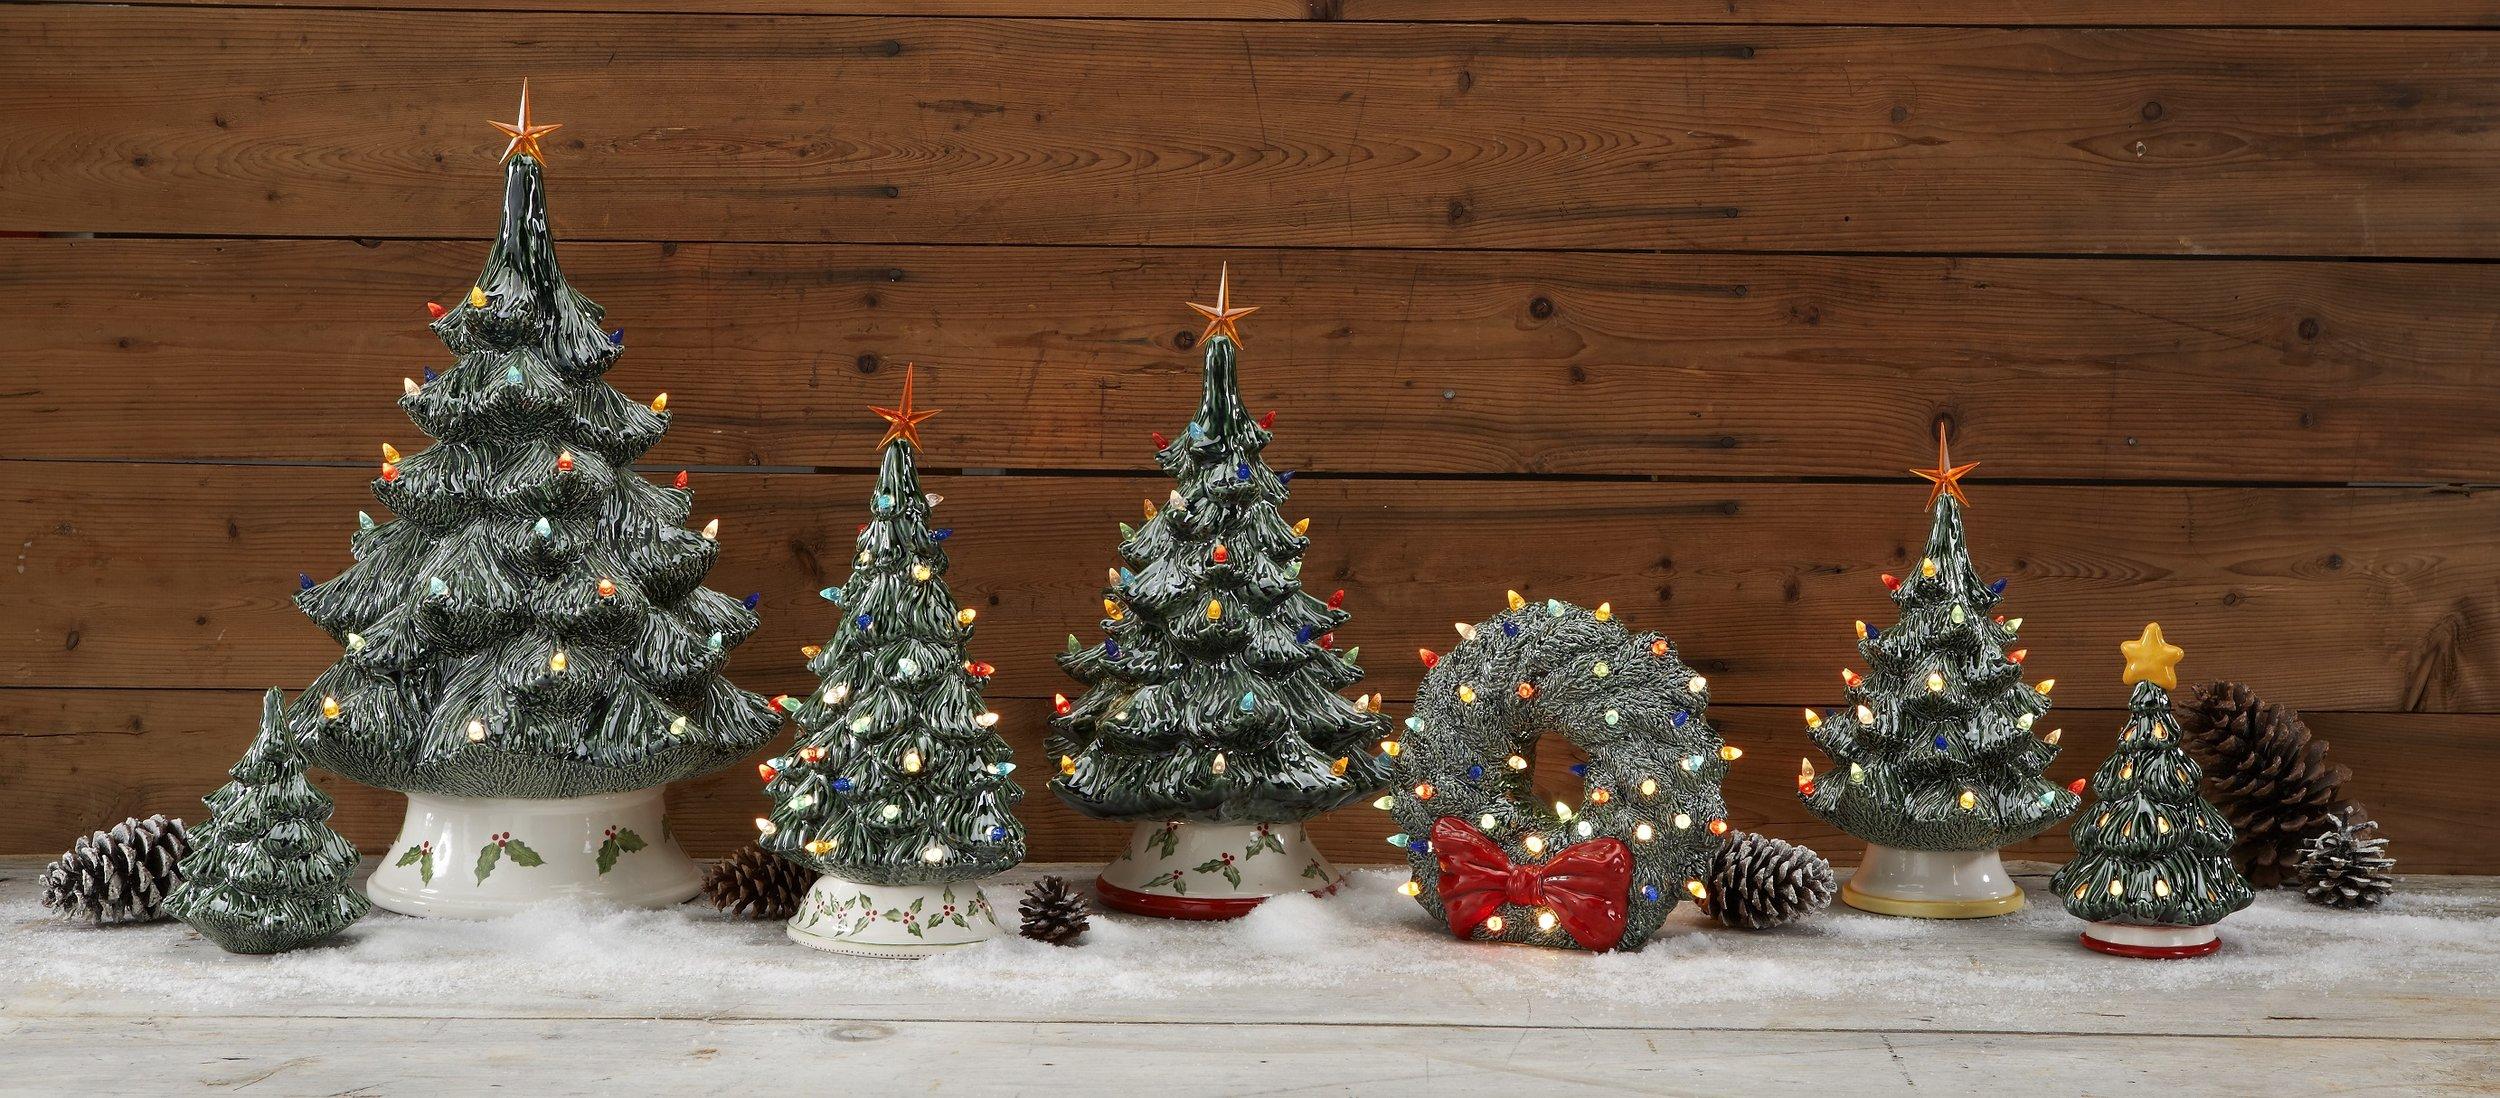 ChristmasTreesHZ_AllGlassGreen_Cropped.jpg